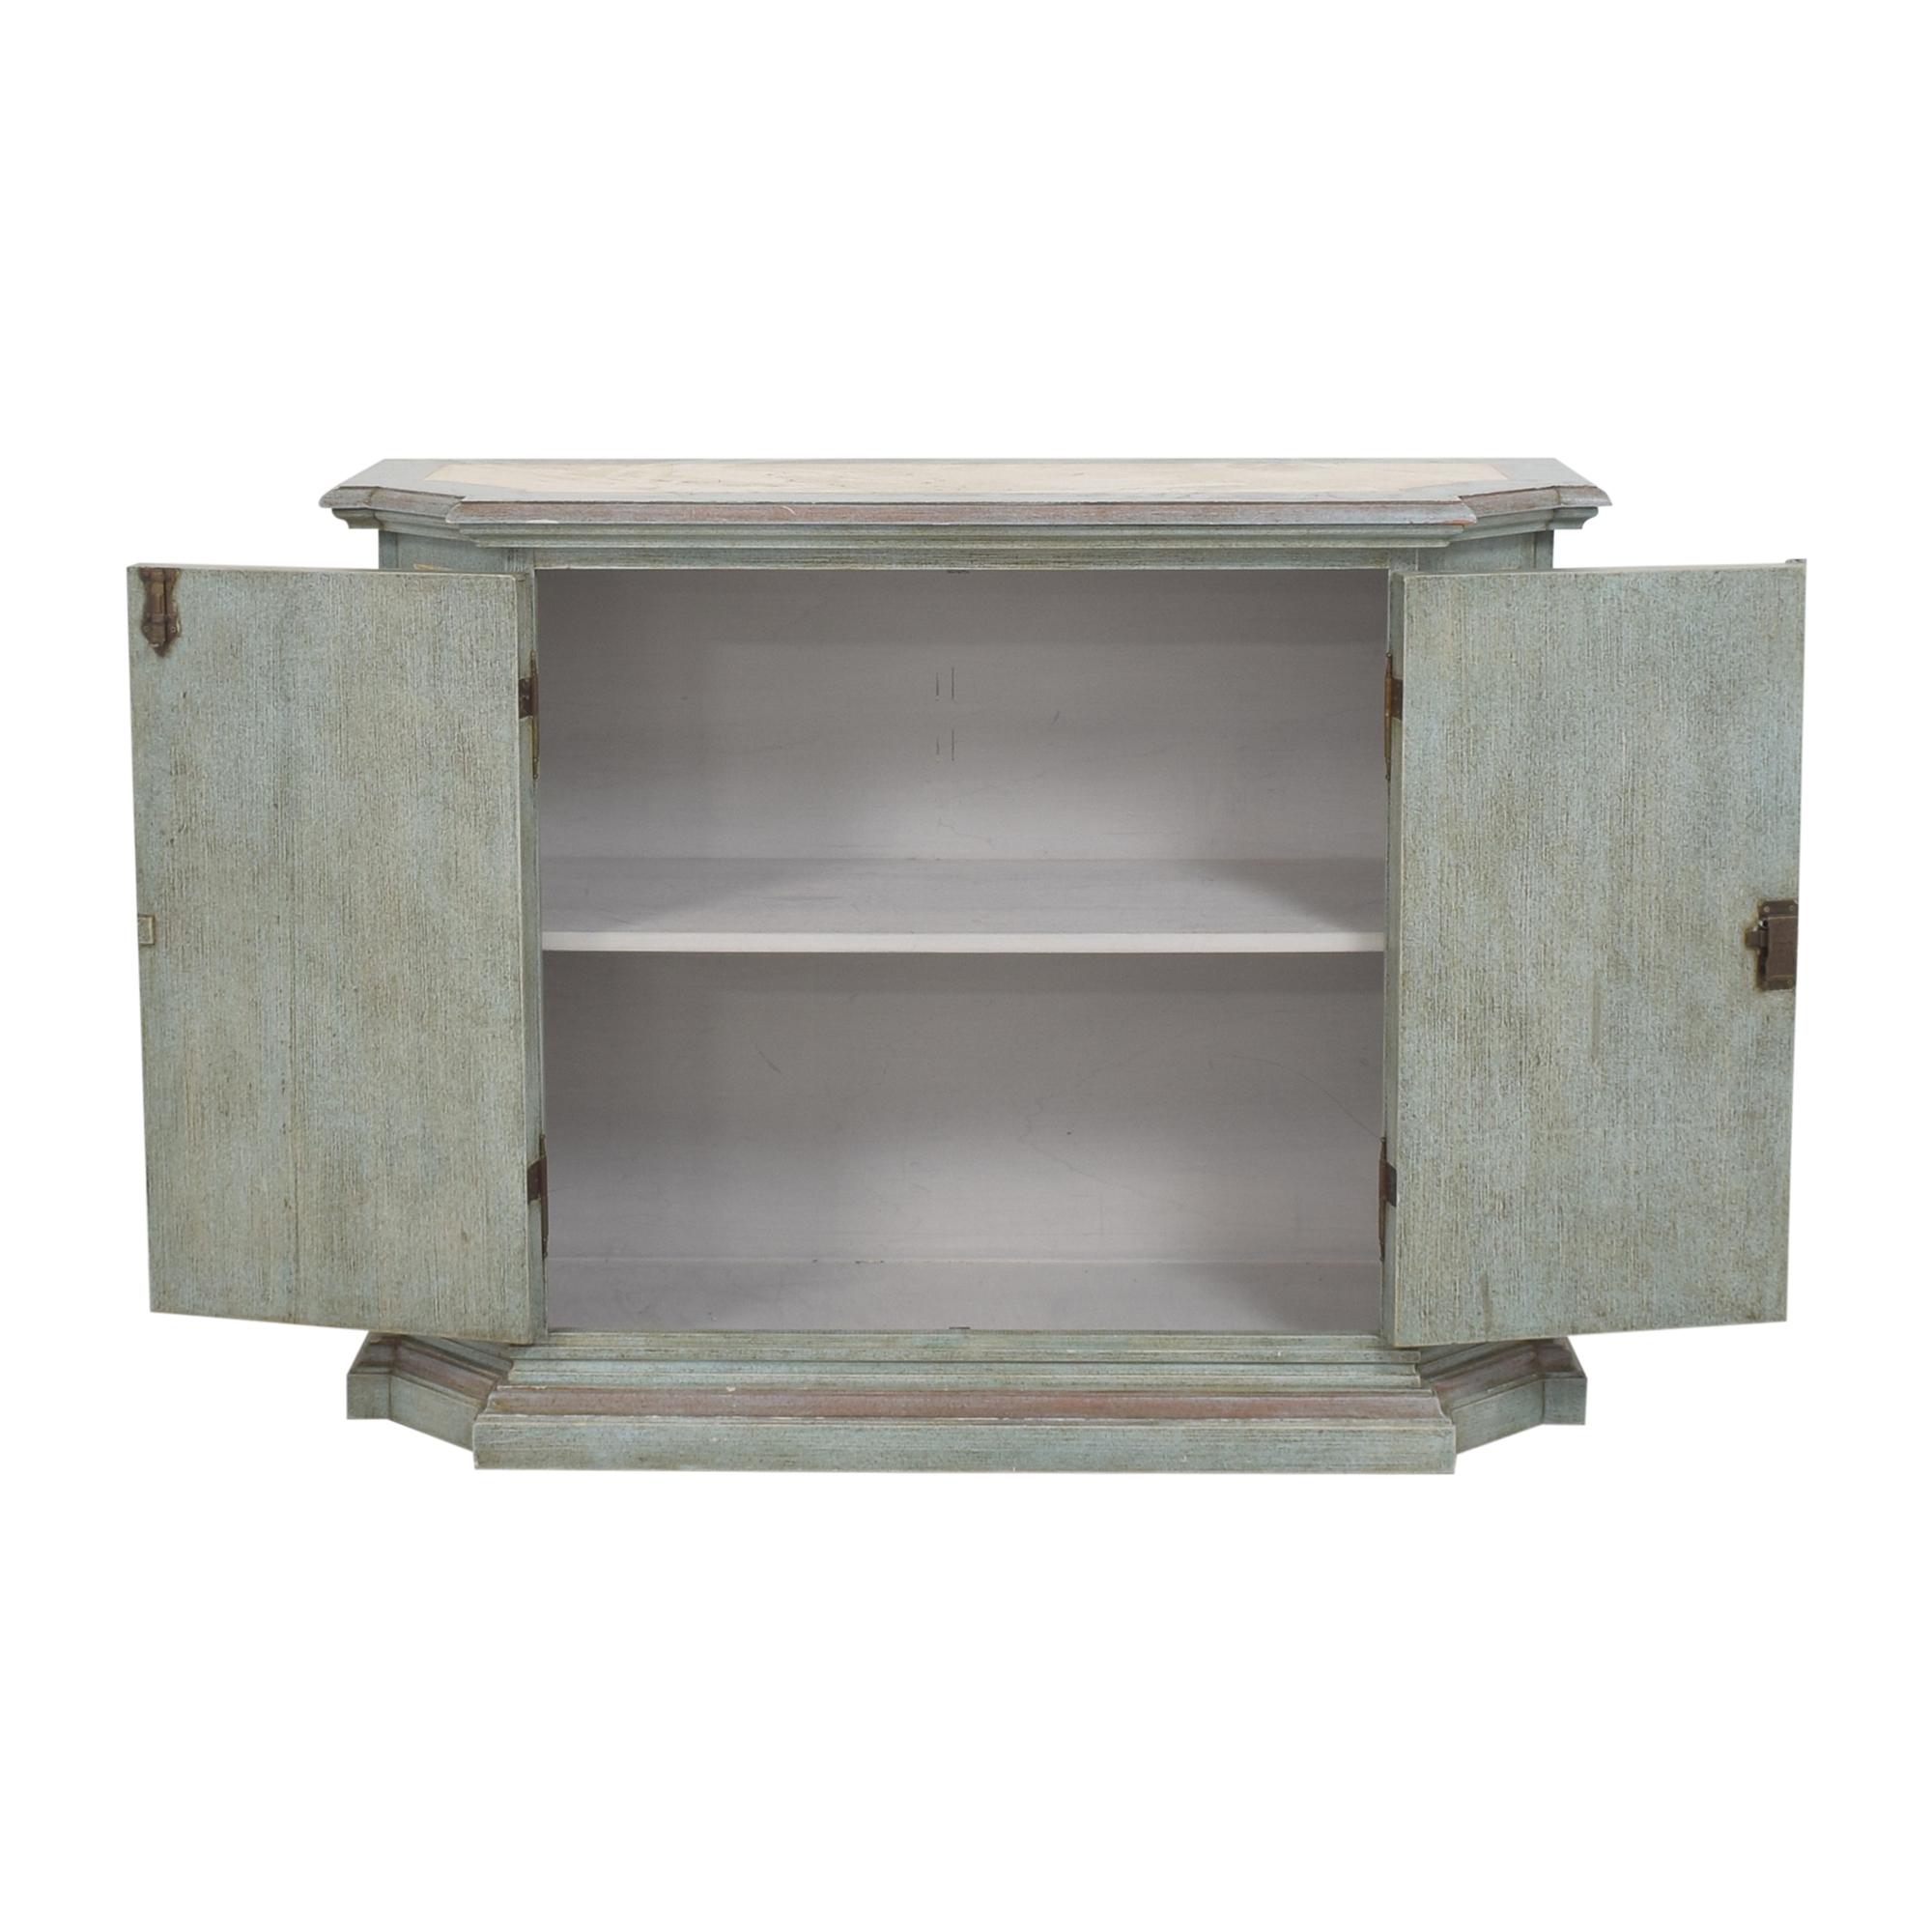 Vintage Painted Cabinet sale